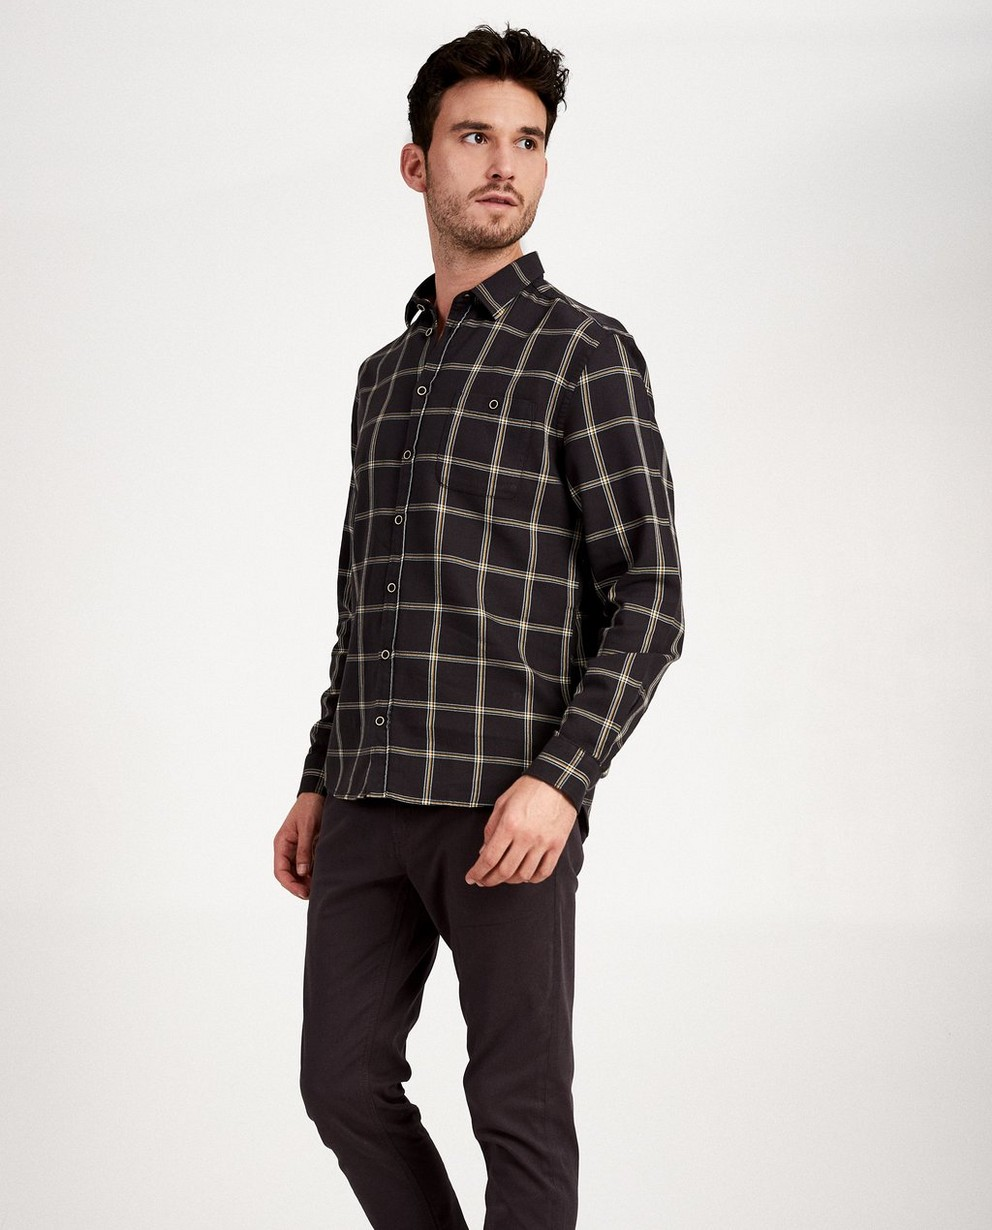 Chemises - AO3 -